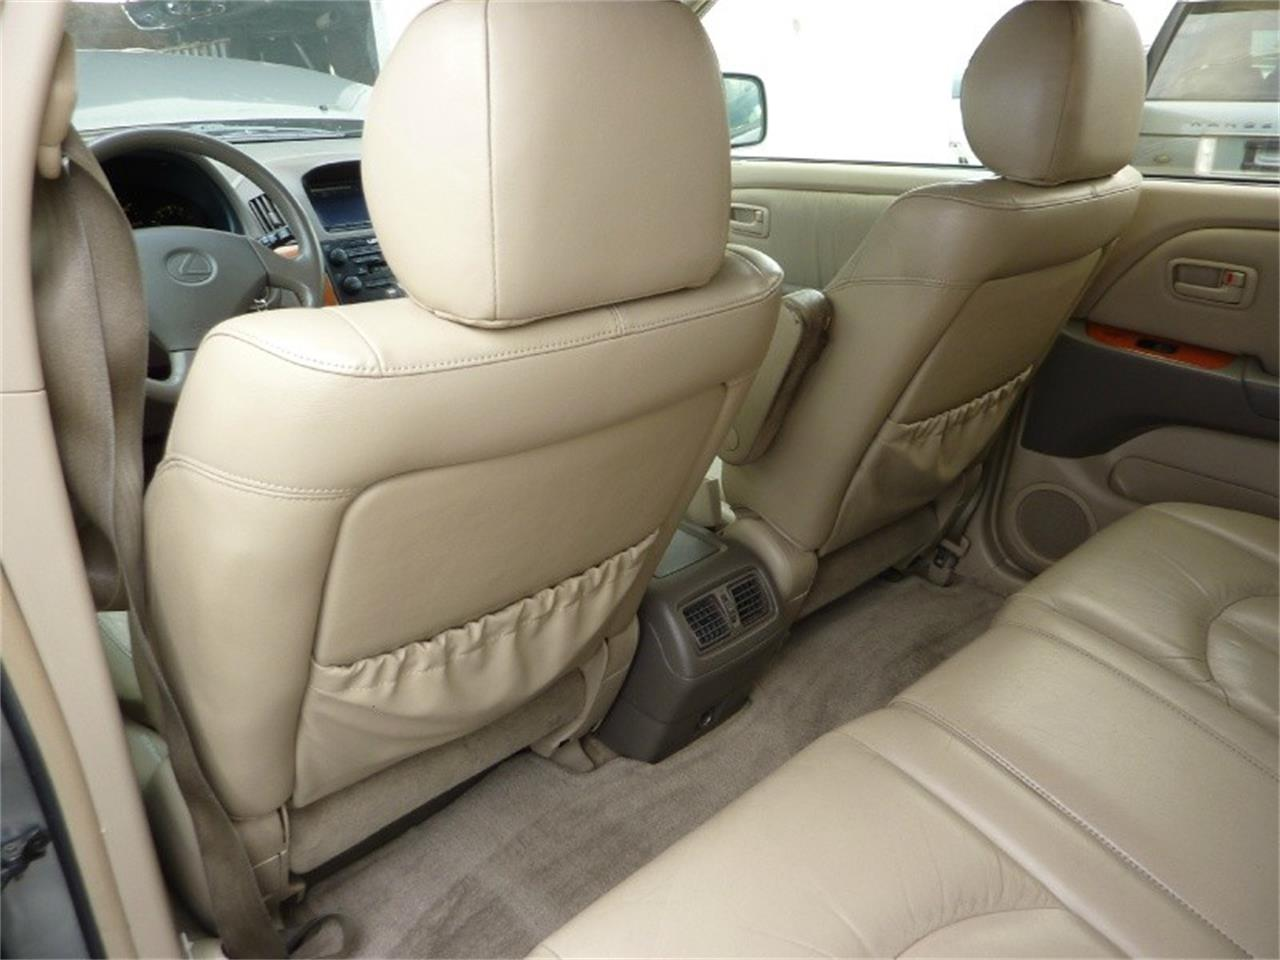 Large Picture of 2000 Lexus RX located in Pahrump Nevada - $2,999.00 - Q1K7